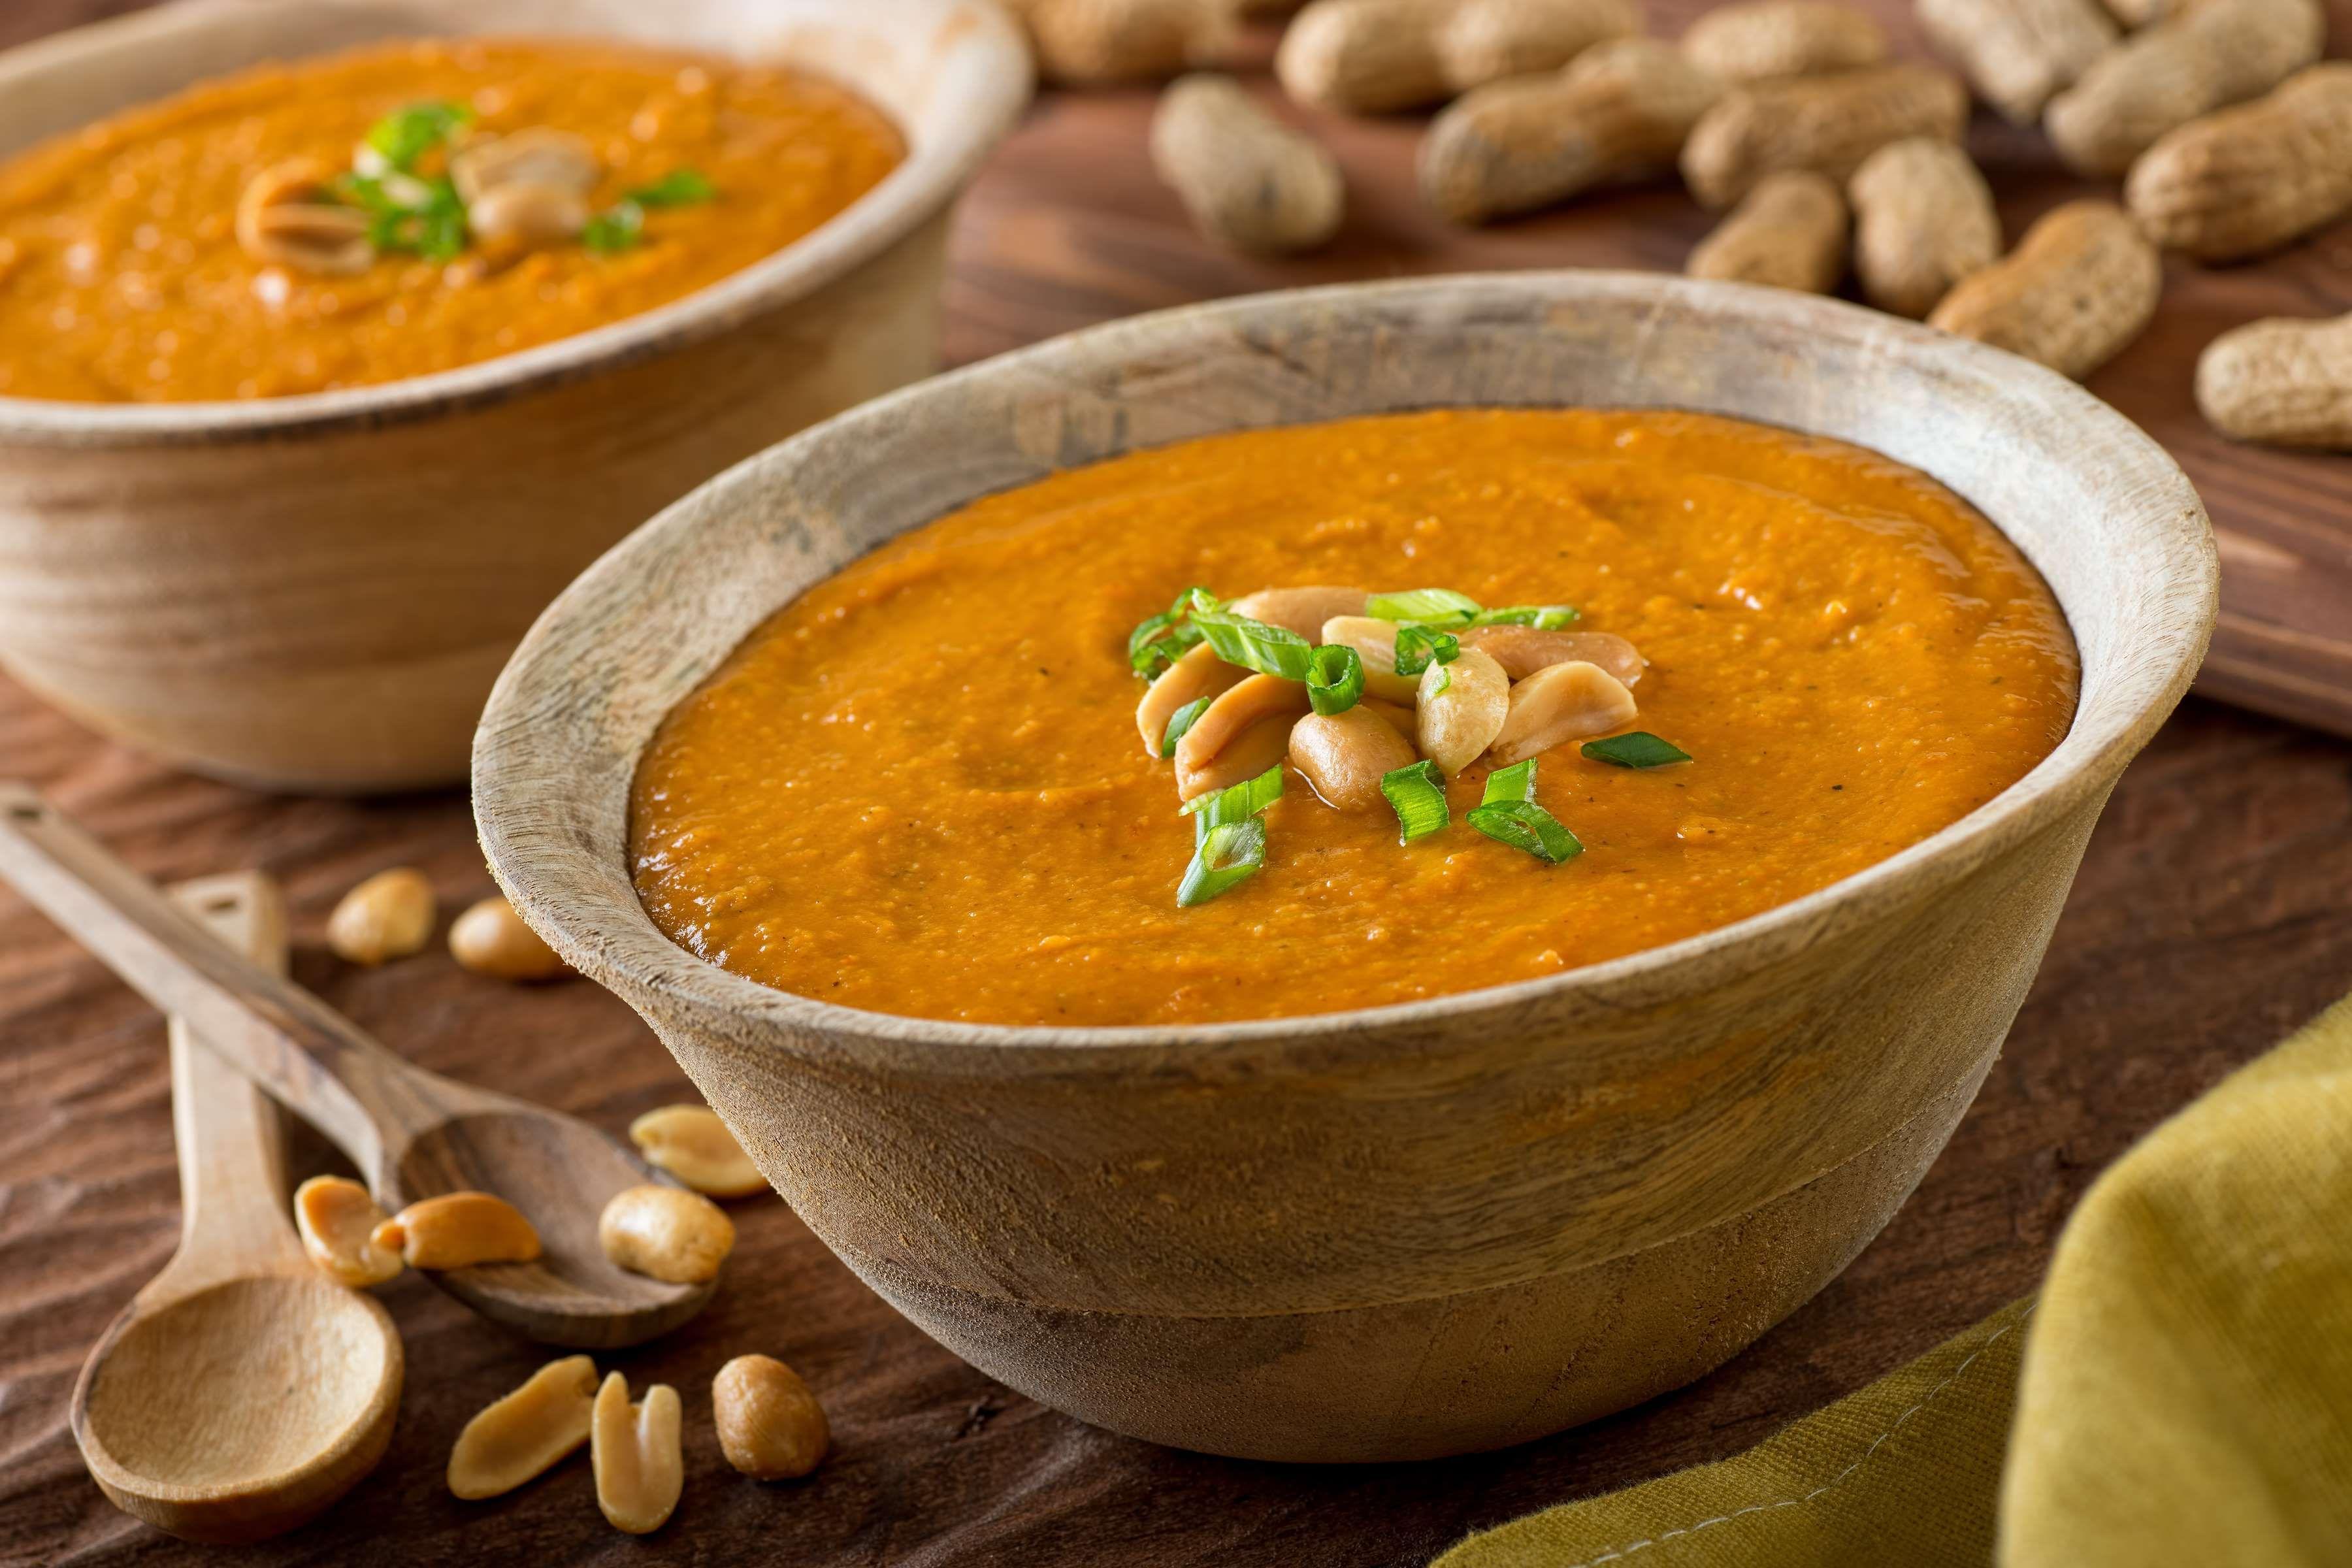 West African Peanut Stew Recipe in